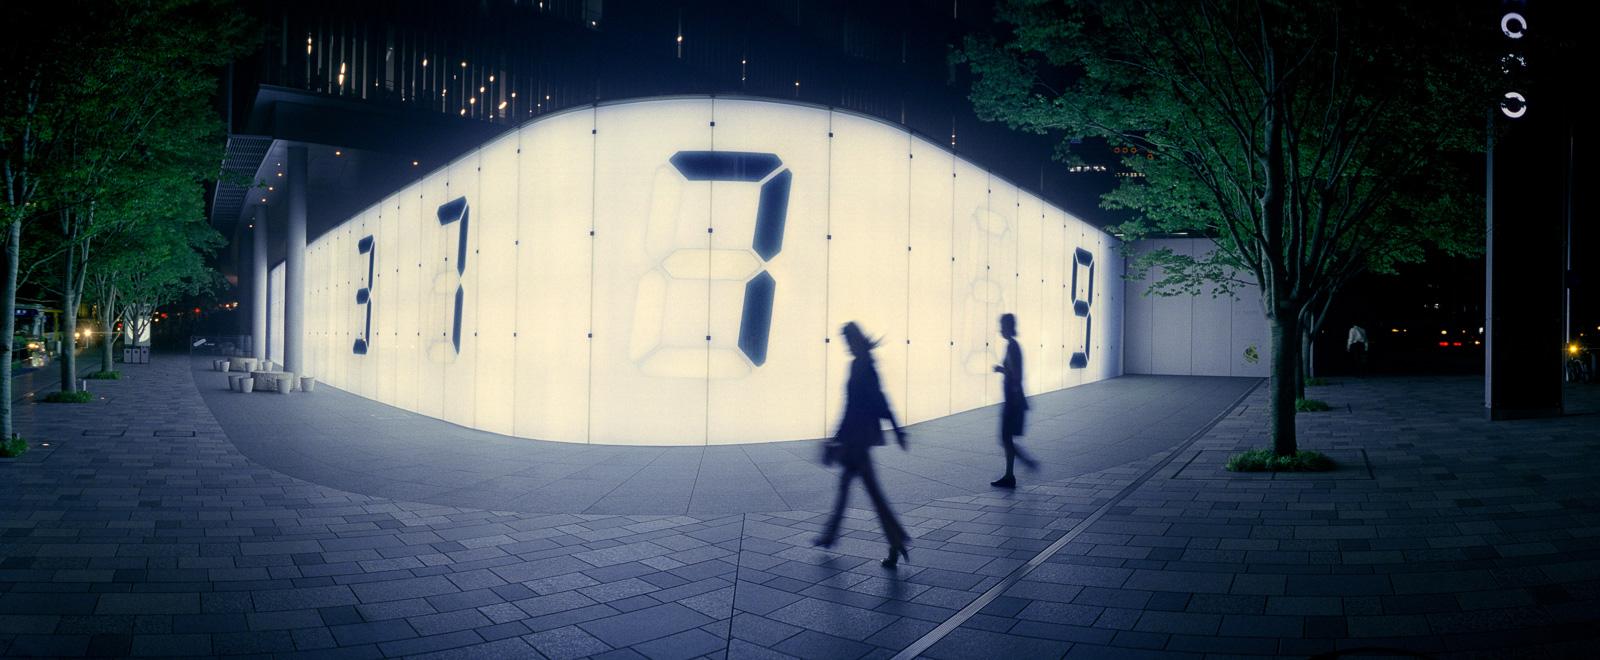 09-roppongi-number-wall-final.jpg